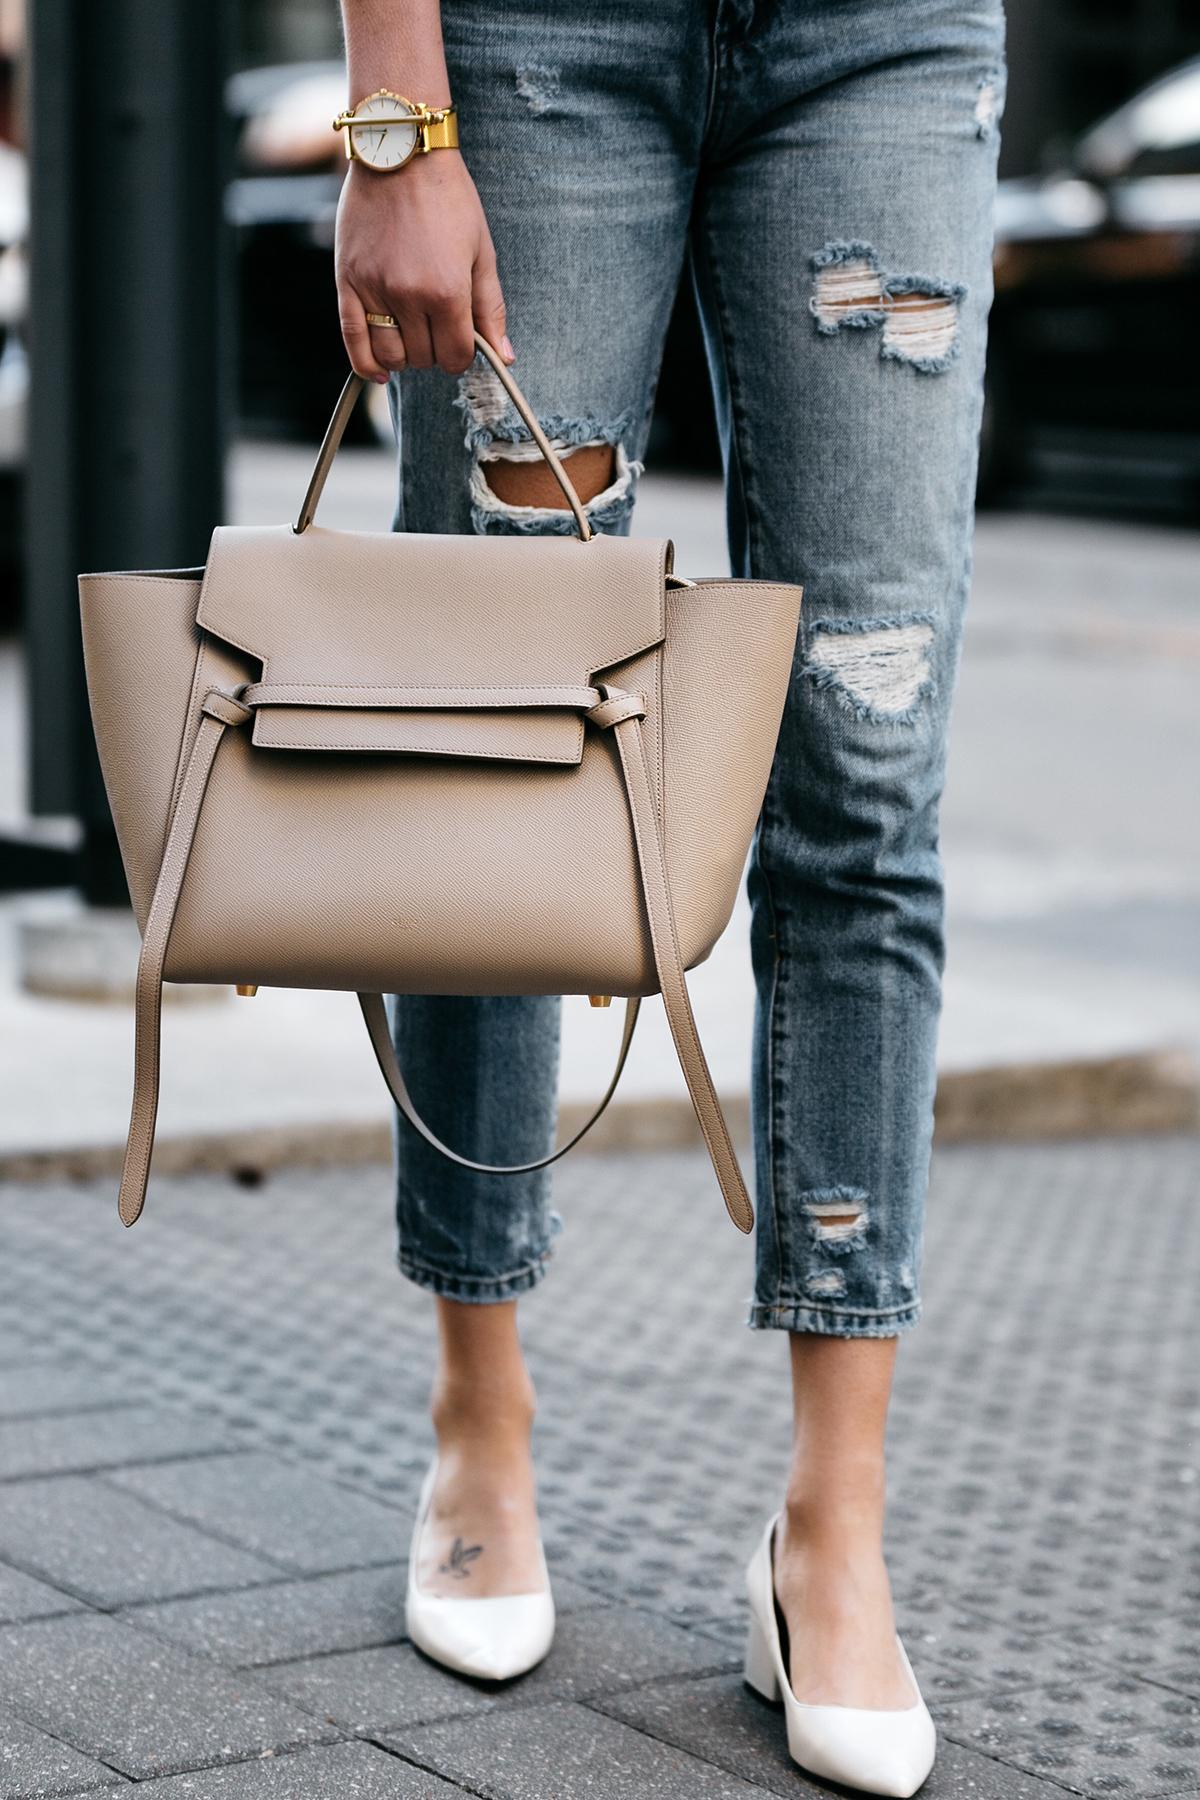 Fashion Jackson, Dallas, Blogger, Fashion Blogger, Street Style, Celine Belt Bag, Zara White Block Heels, Blanknyc Denim Ripped Mom Jeans